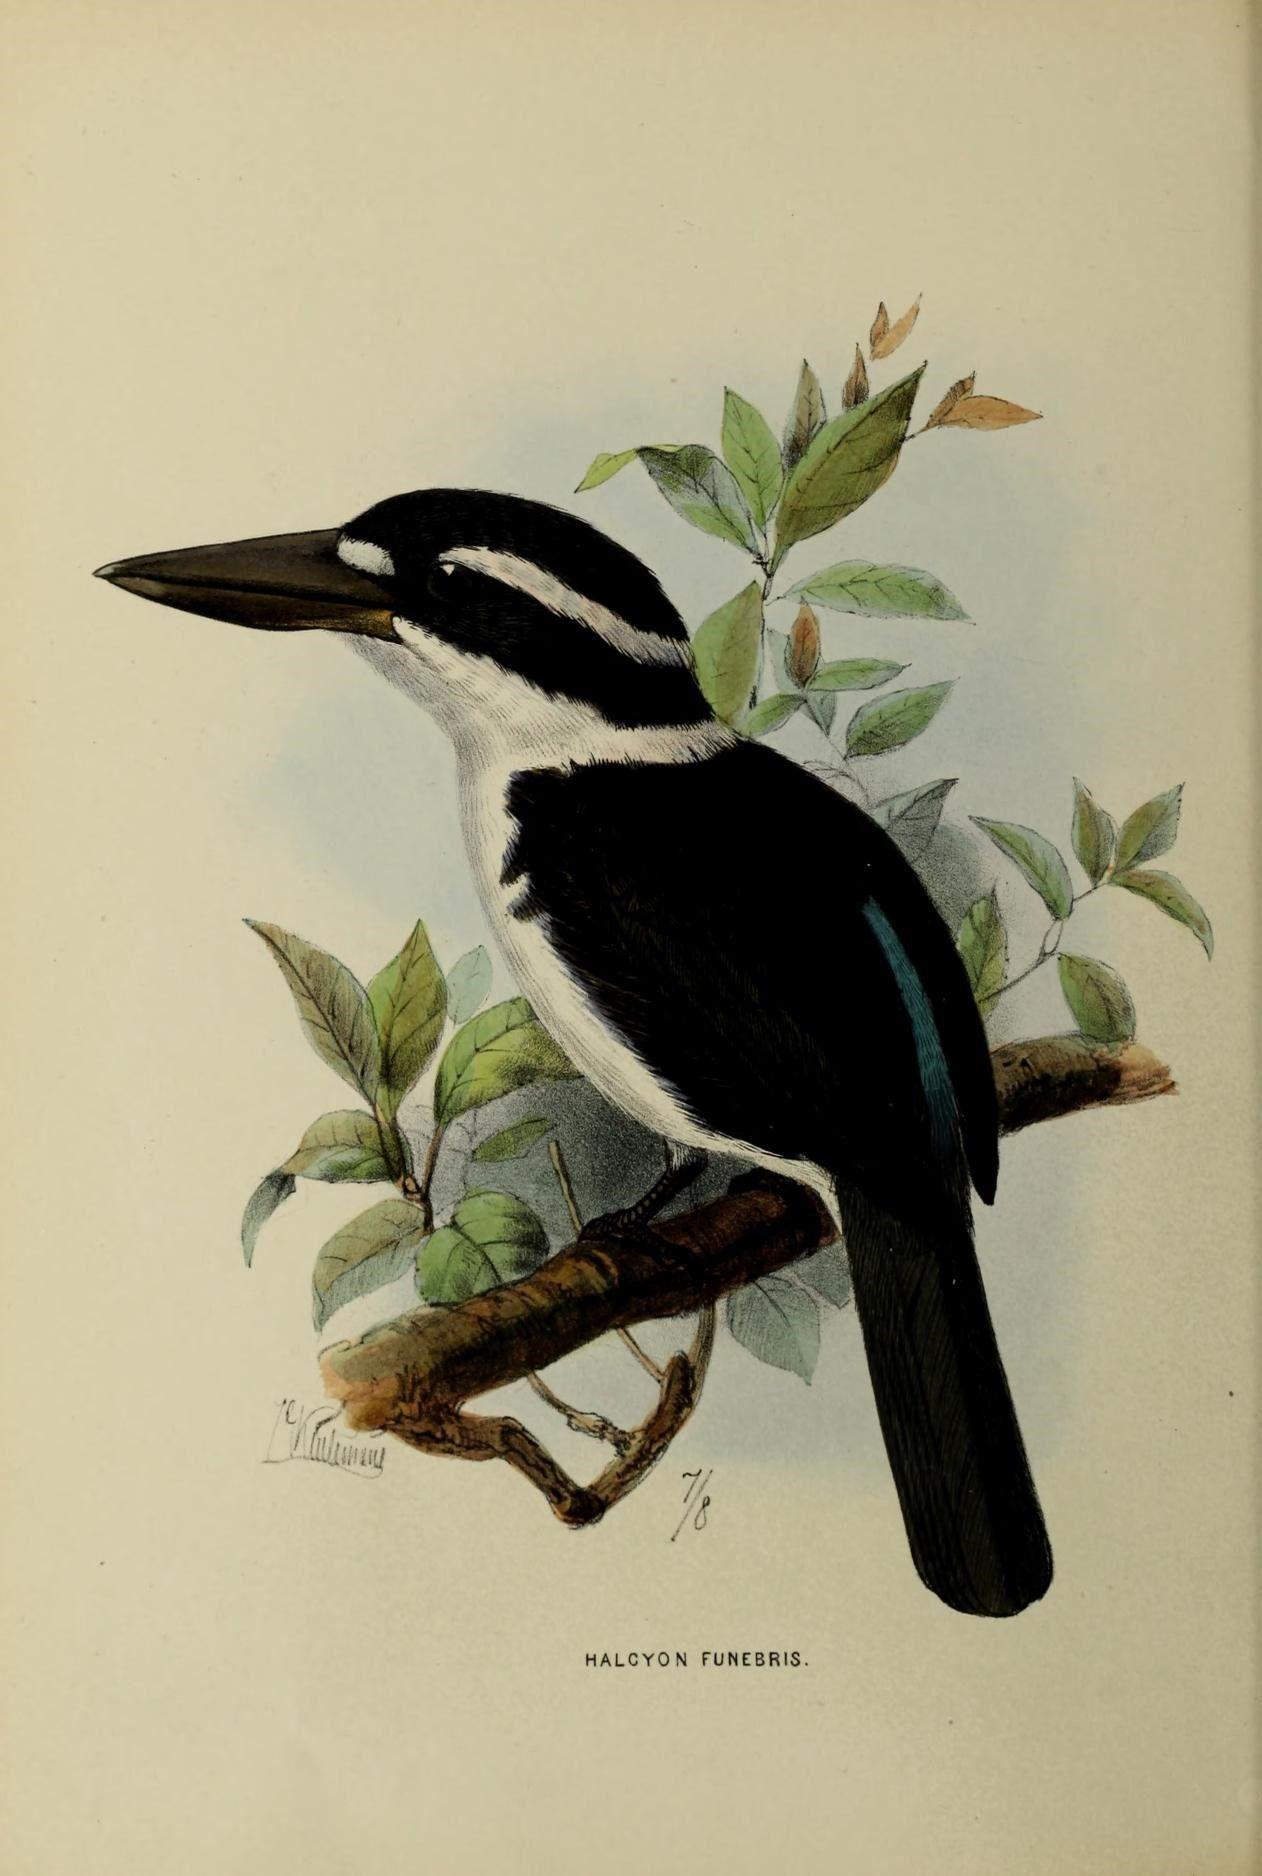 1119. Sombre Kingfisher (Todiramphus funebris) endemic